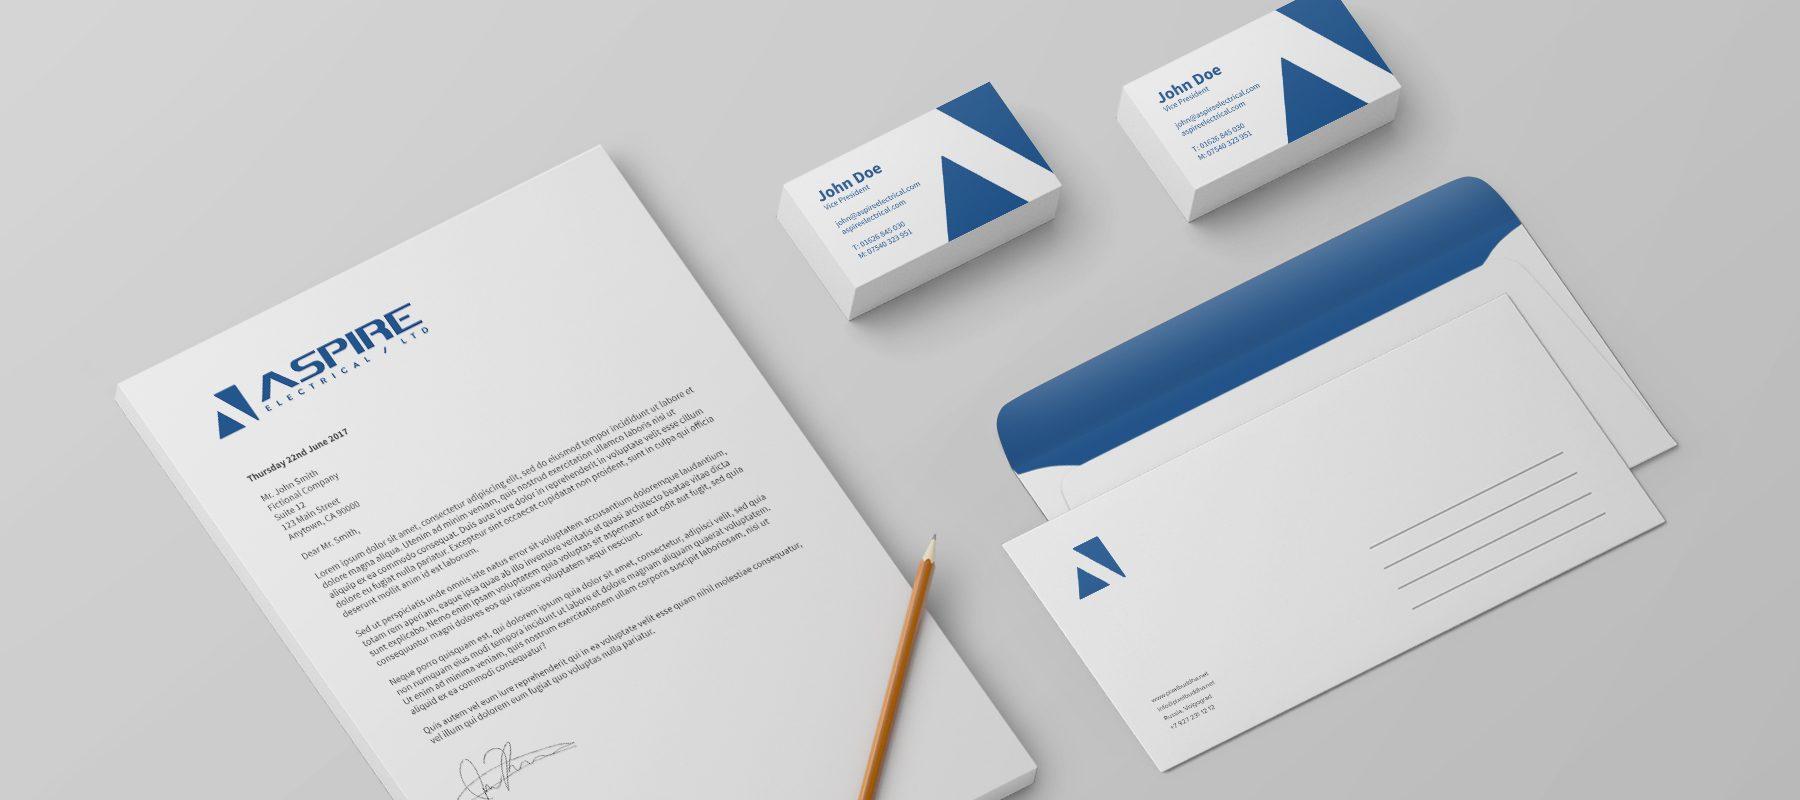 branded stationery mockup aspire electrical graphic print design